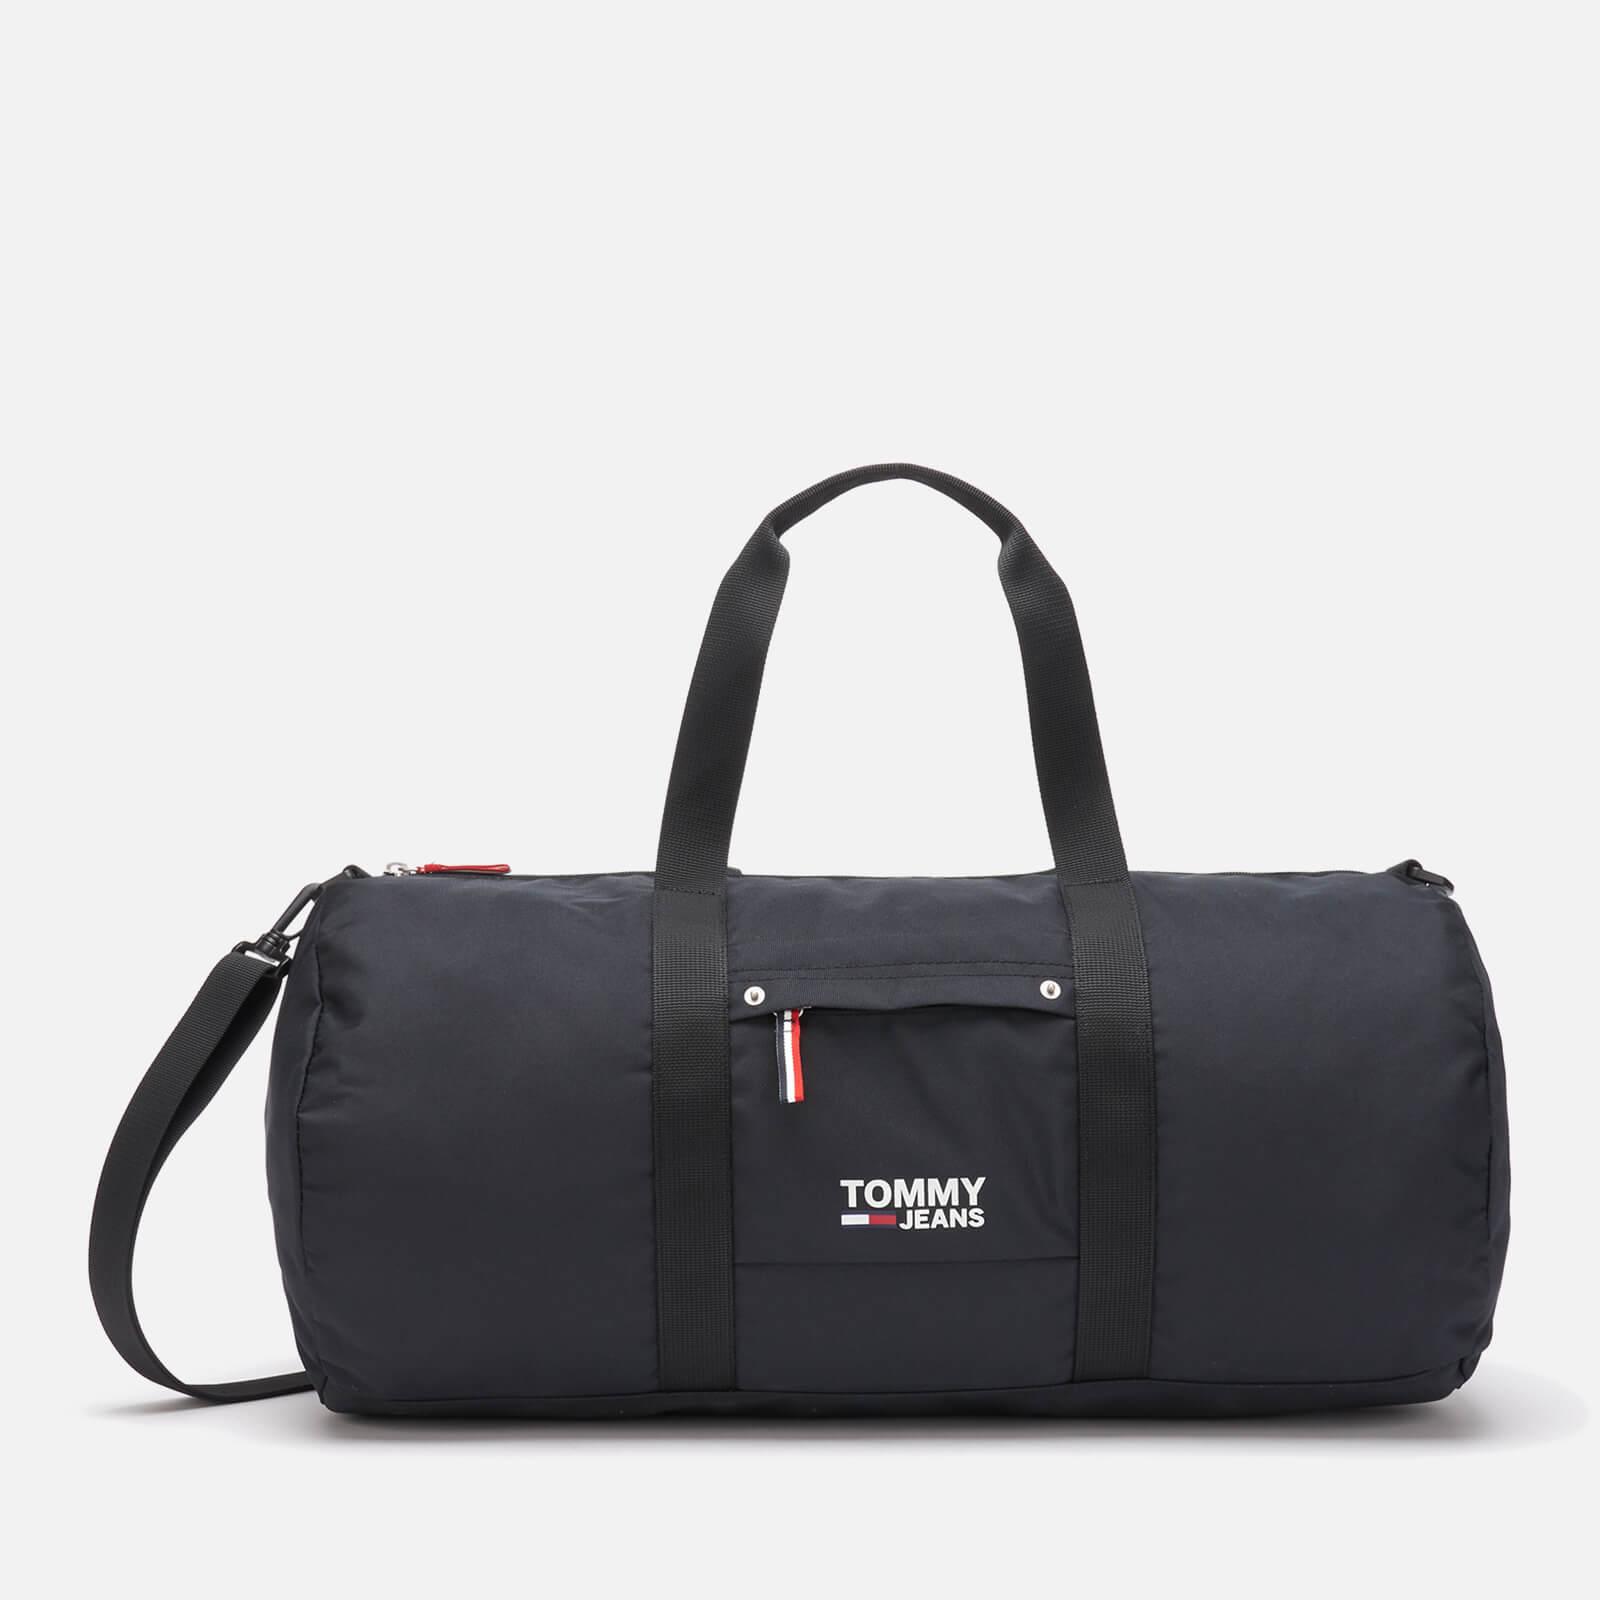 afb840c5 Tommy Jeans Men's Cool City Duffle Bag - Black